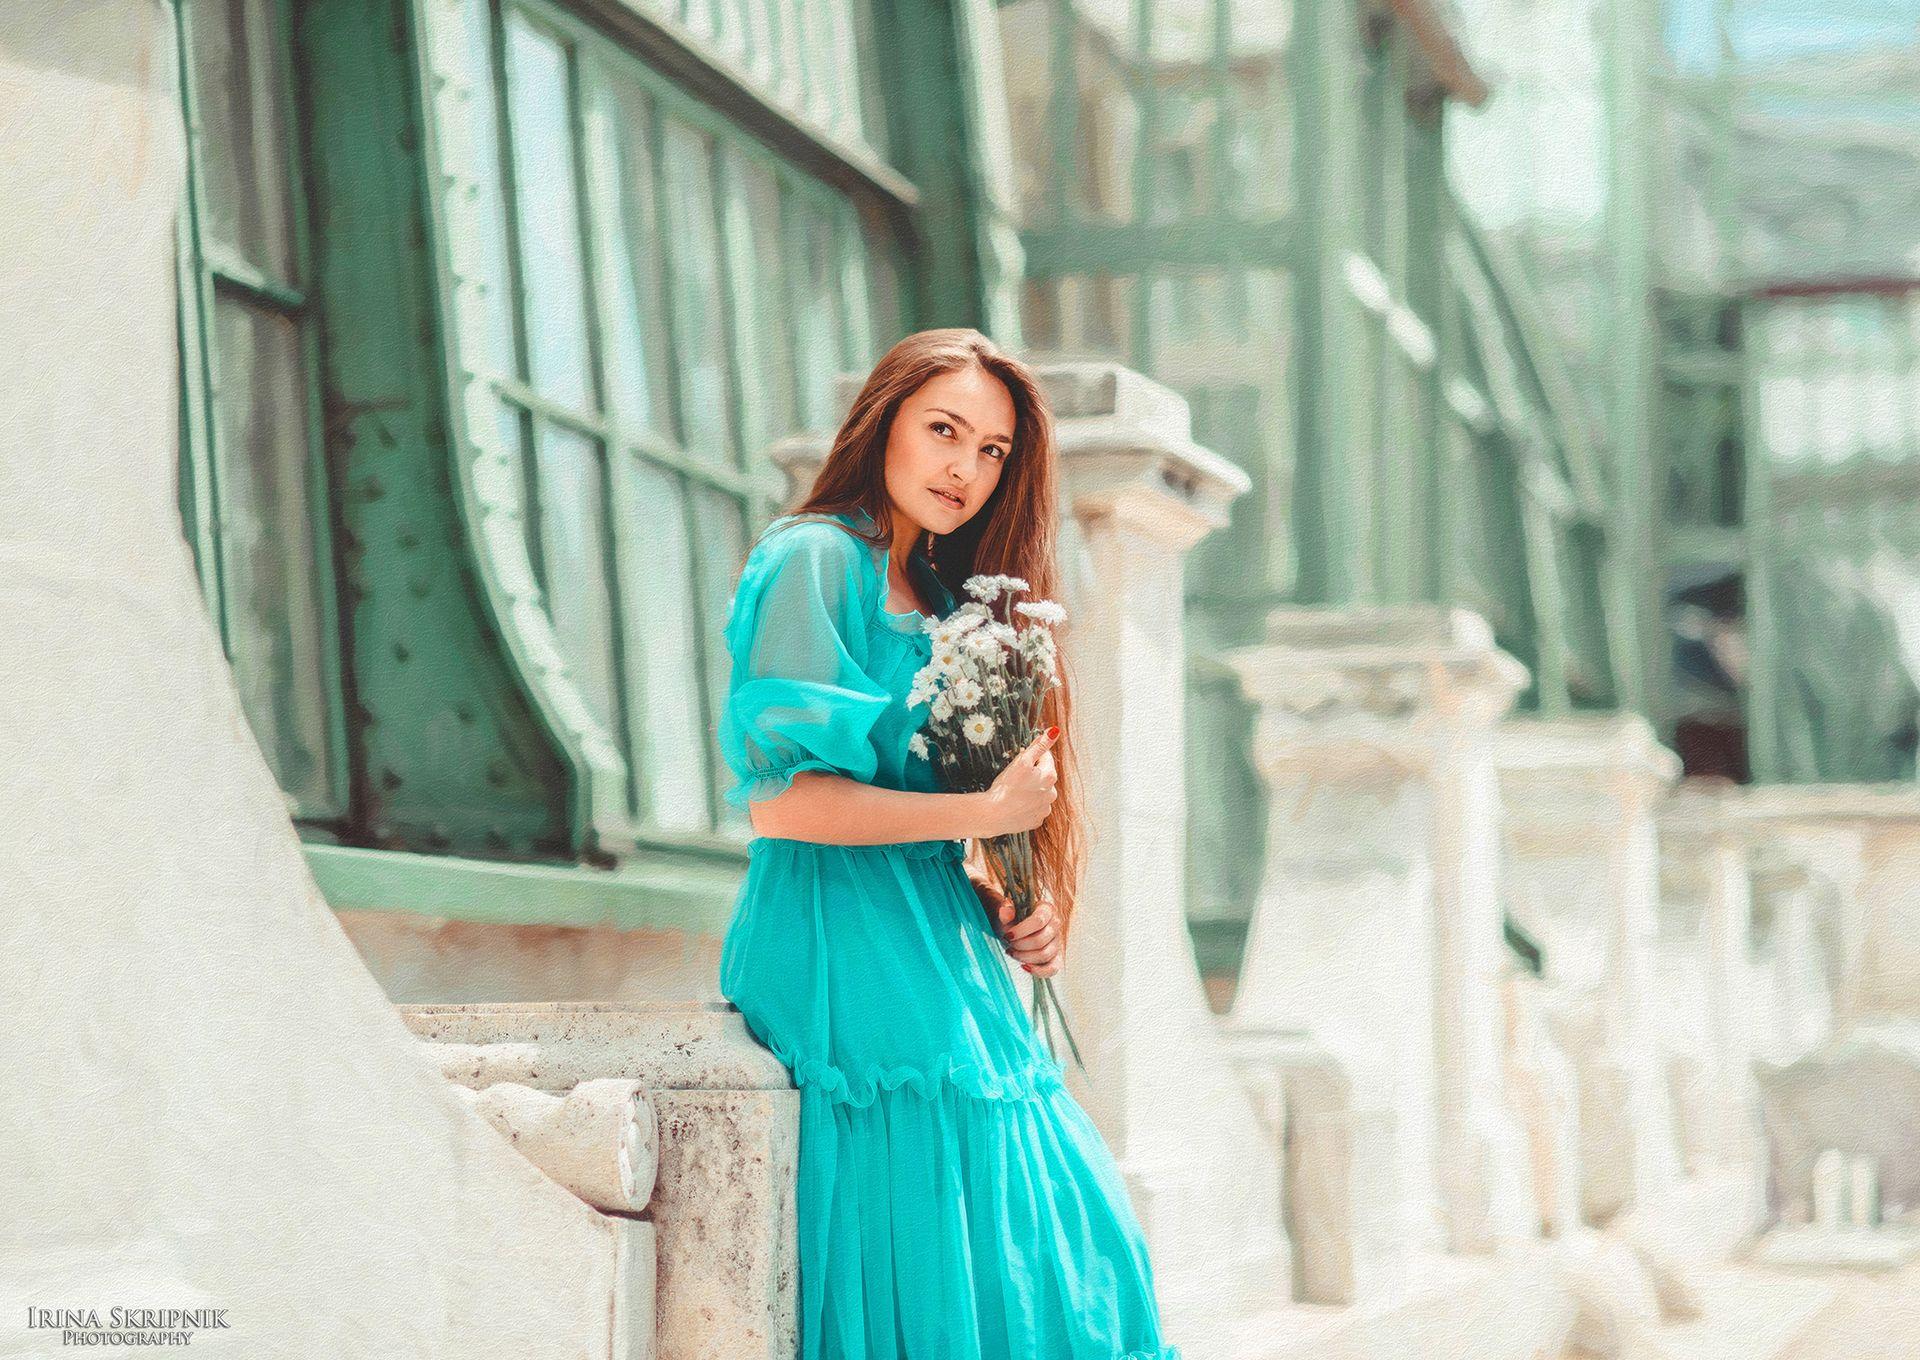 Irina Skripnik Photography 31013